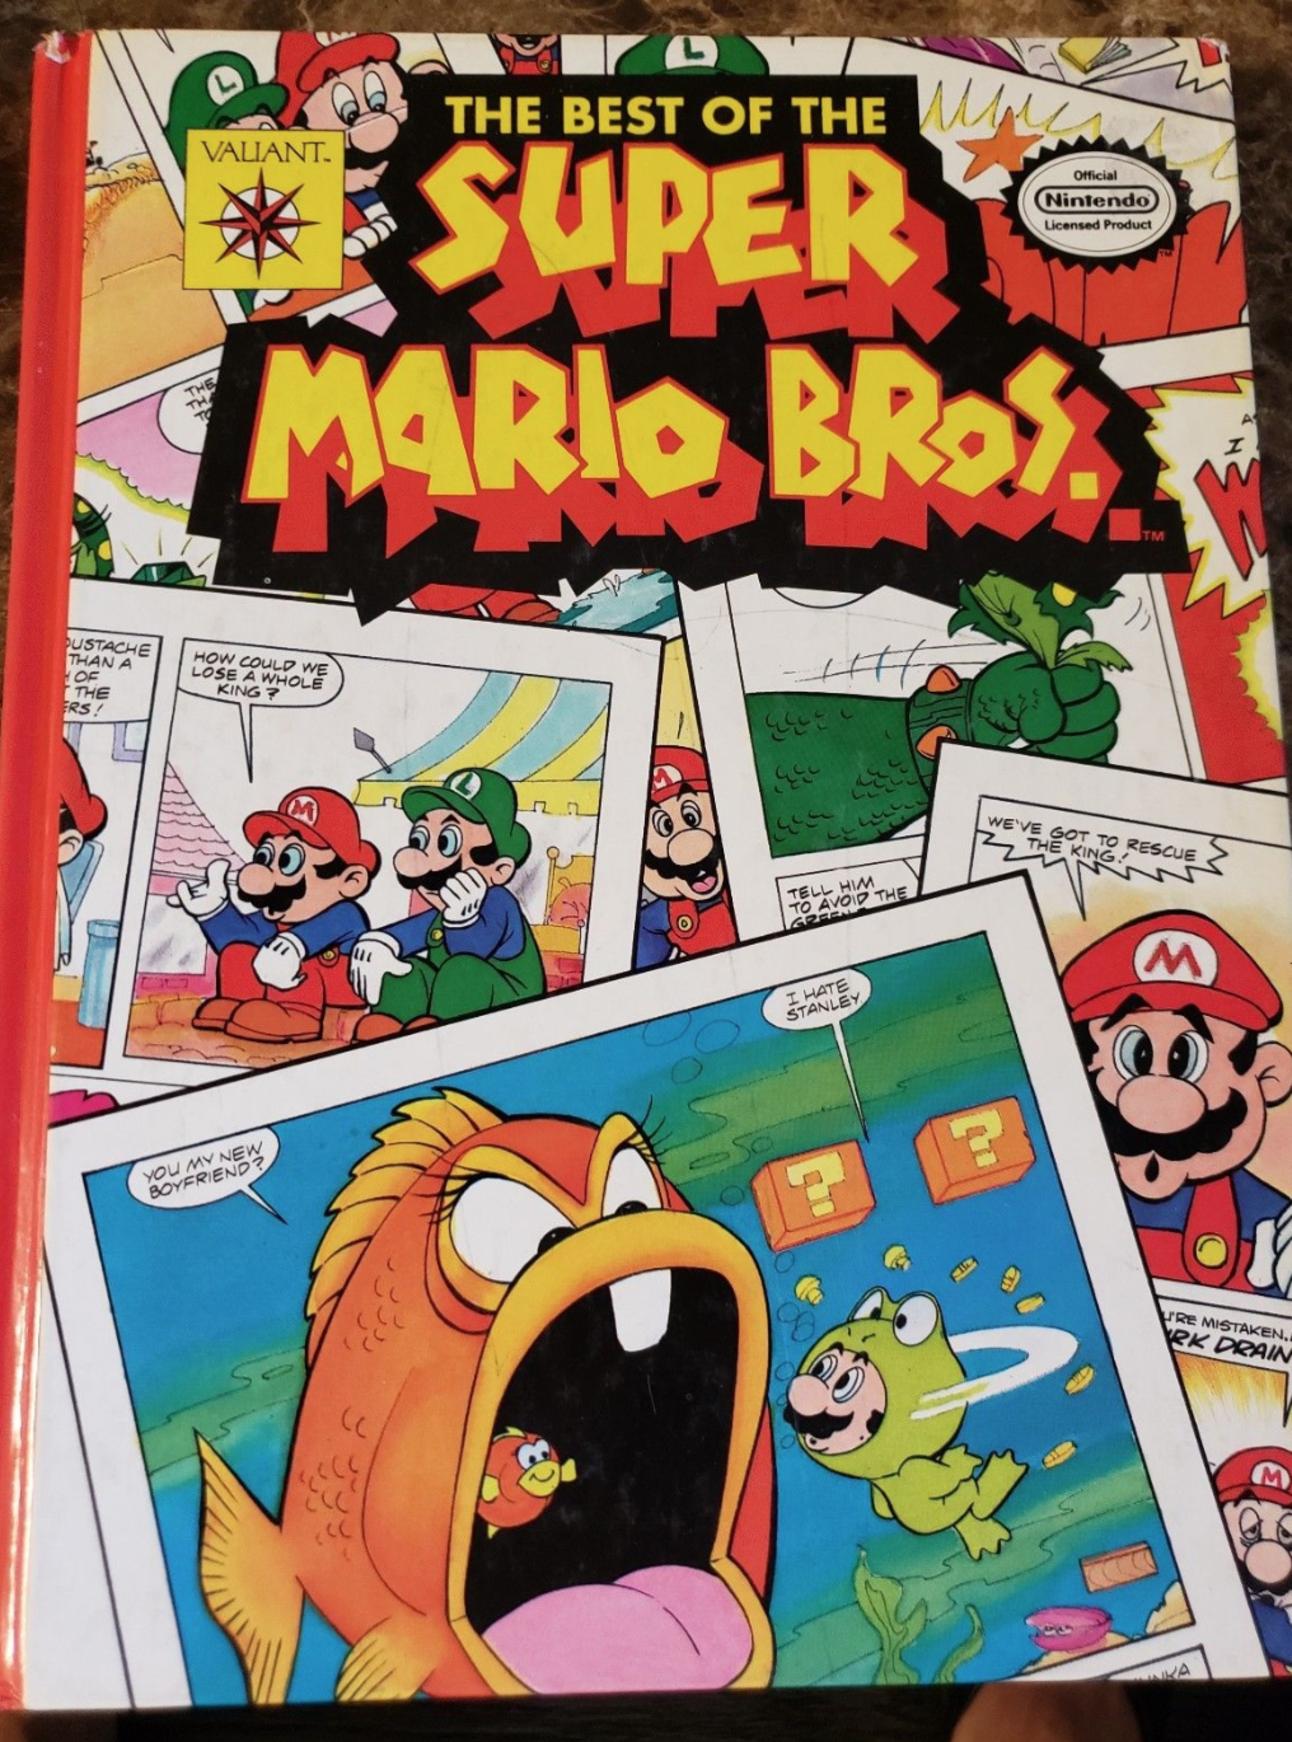 Mario Bros. comics